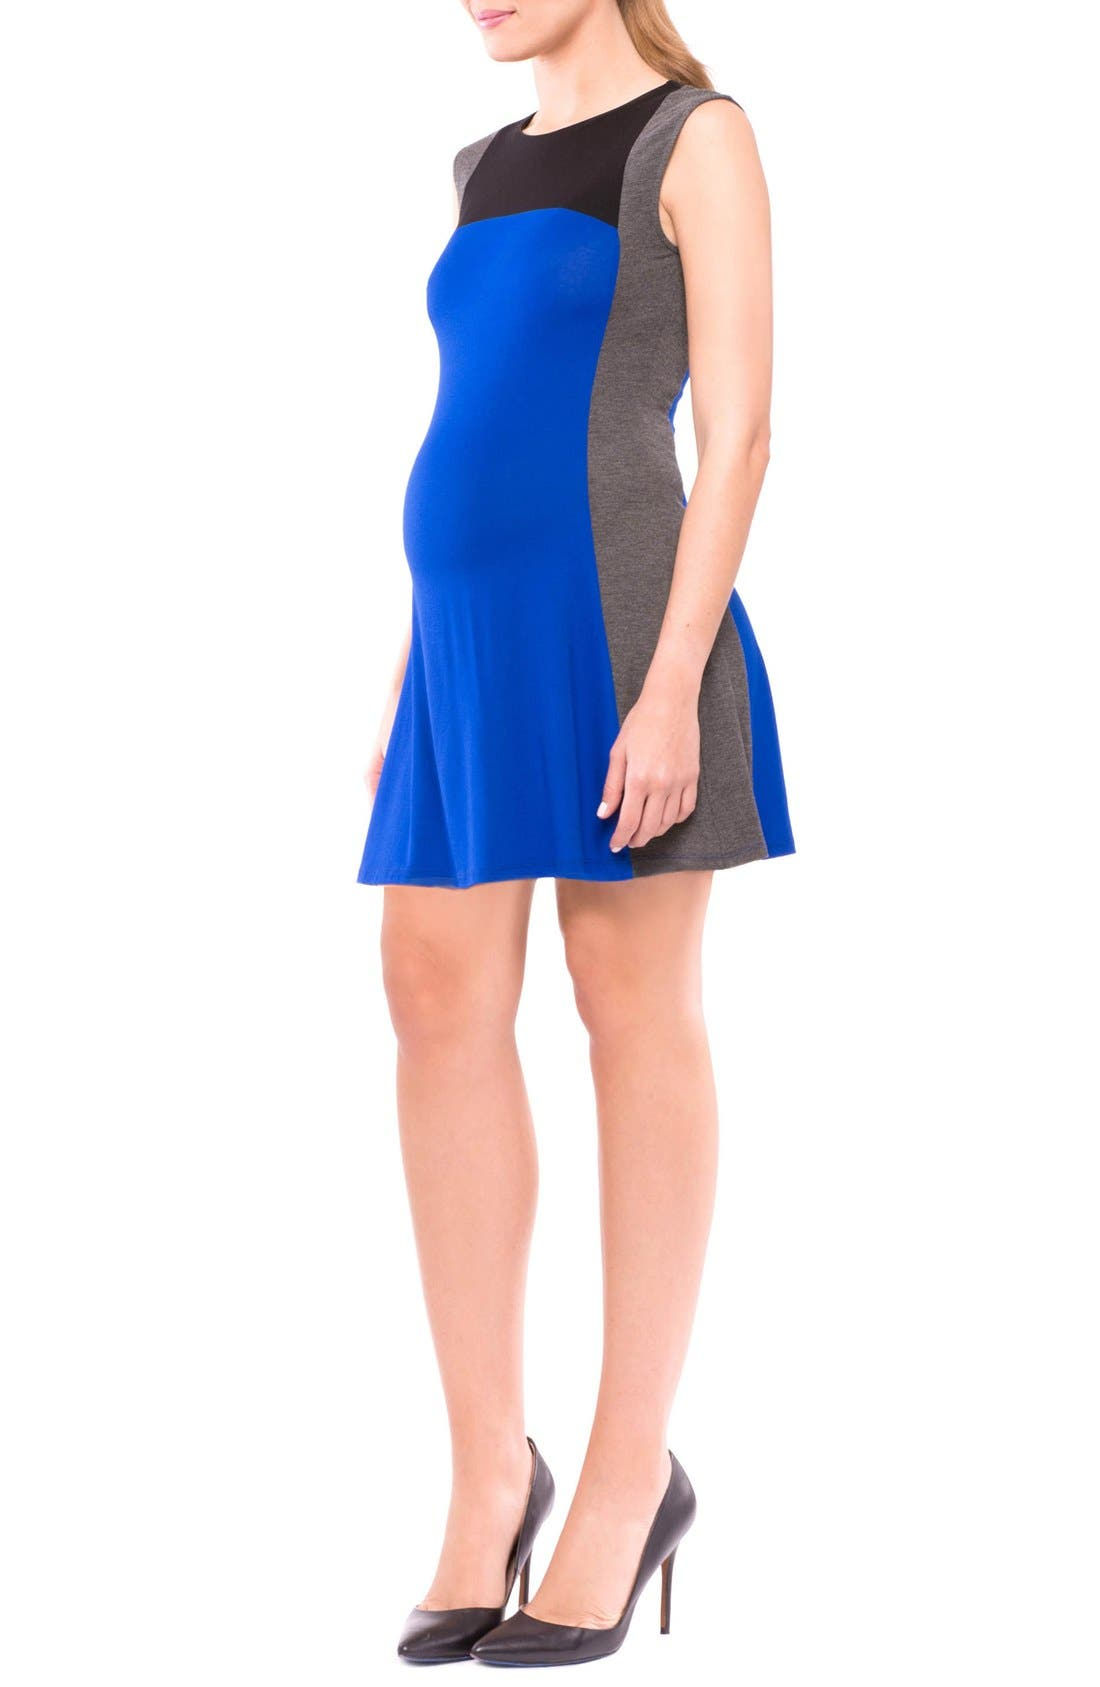 Margarett Maternity Dress,                             Alternate thumbnail 3, color,                             True Blue/ Grey/ Black